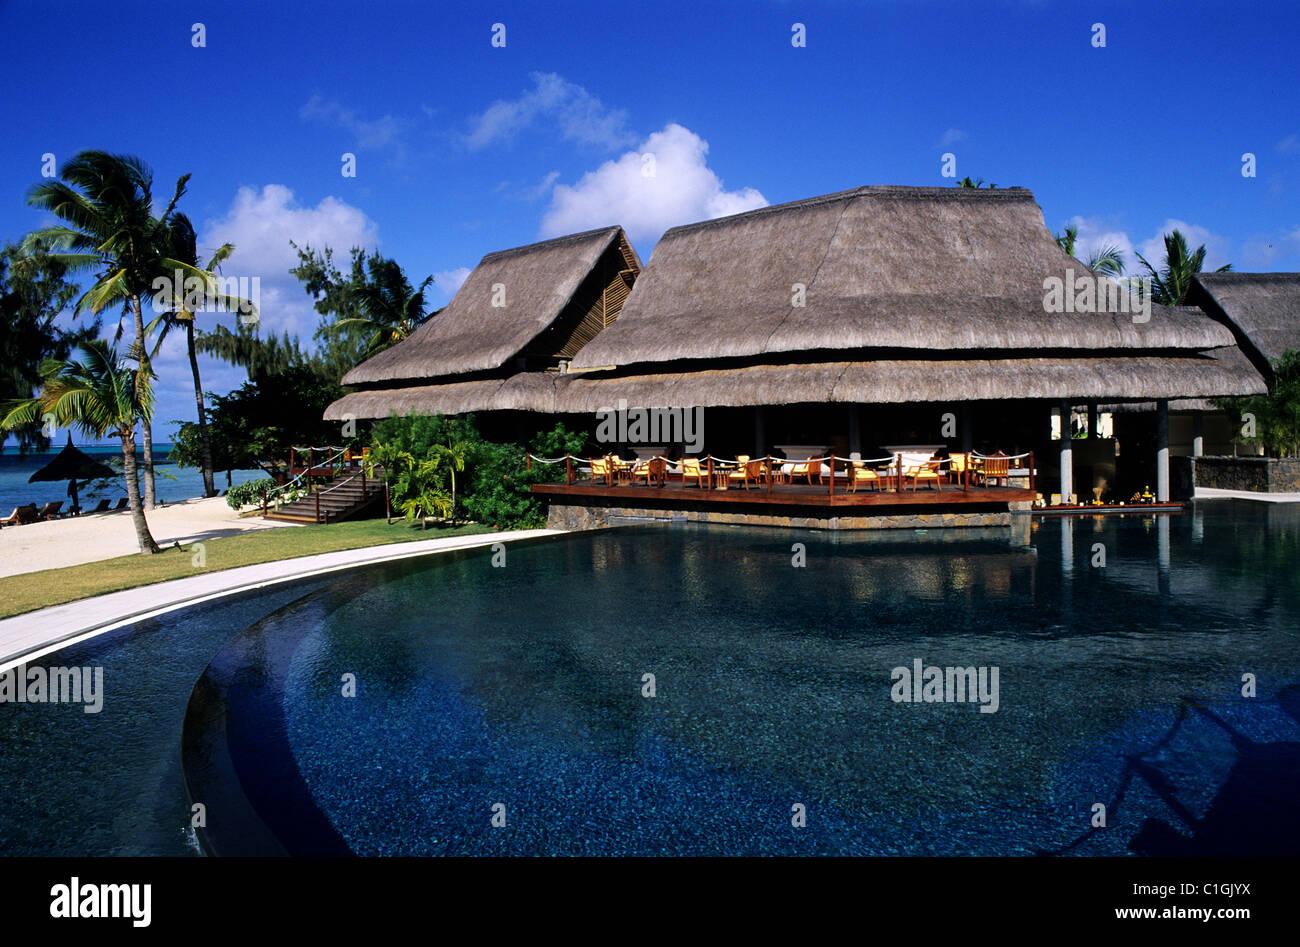 Maurice Islande, Île Maurice hôtel luxe Photo Stock